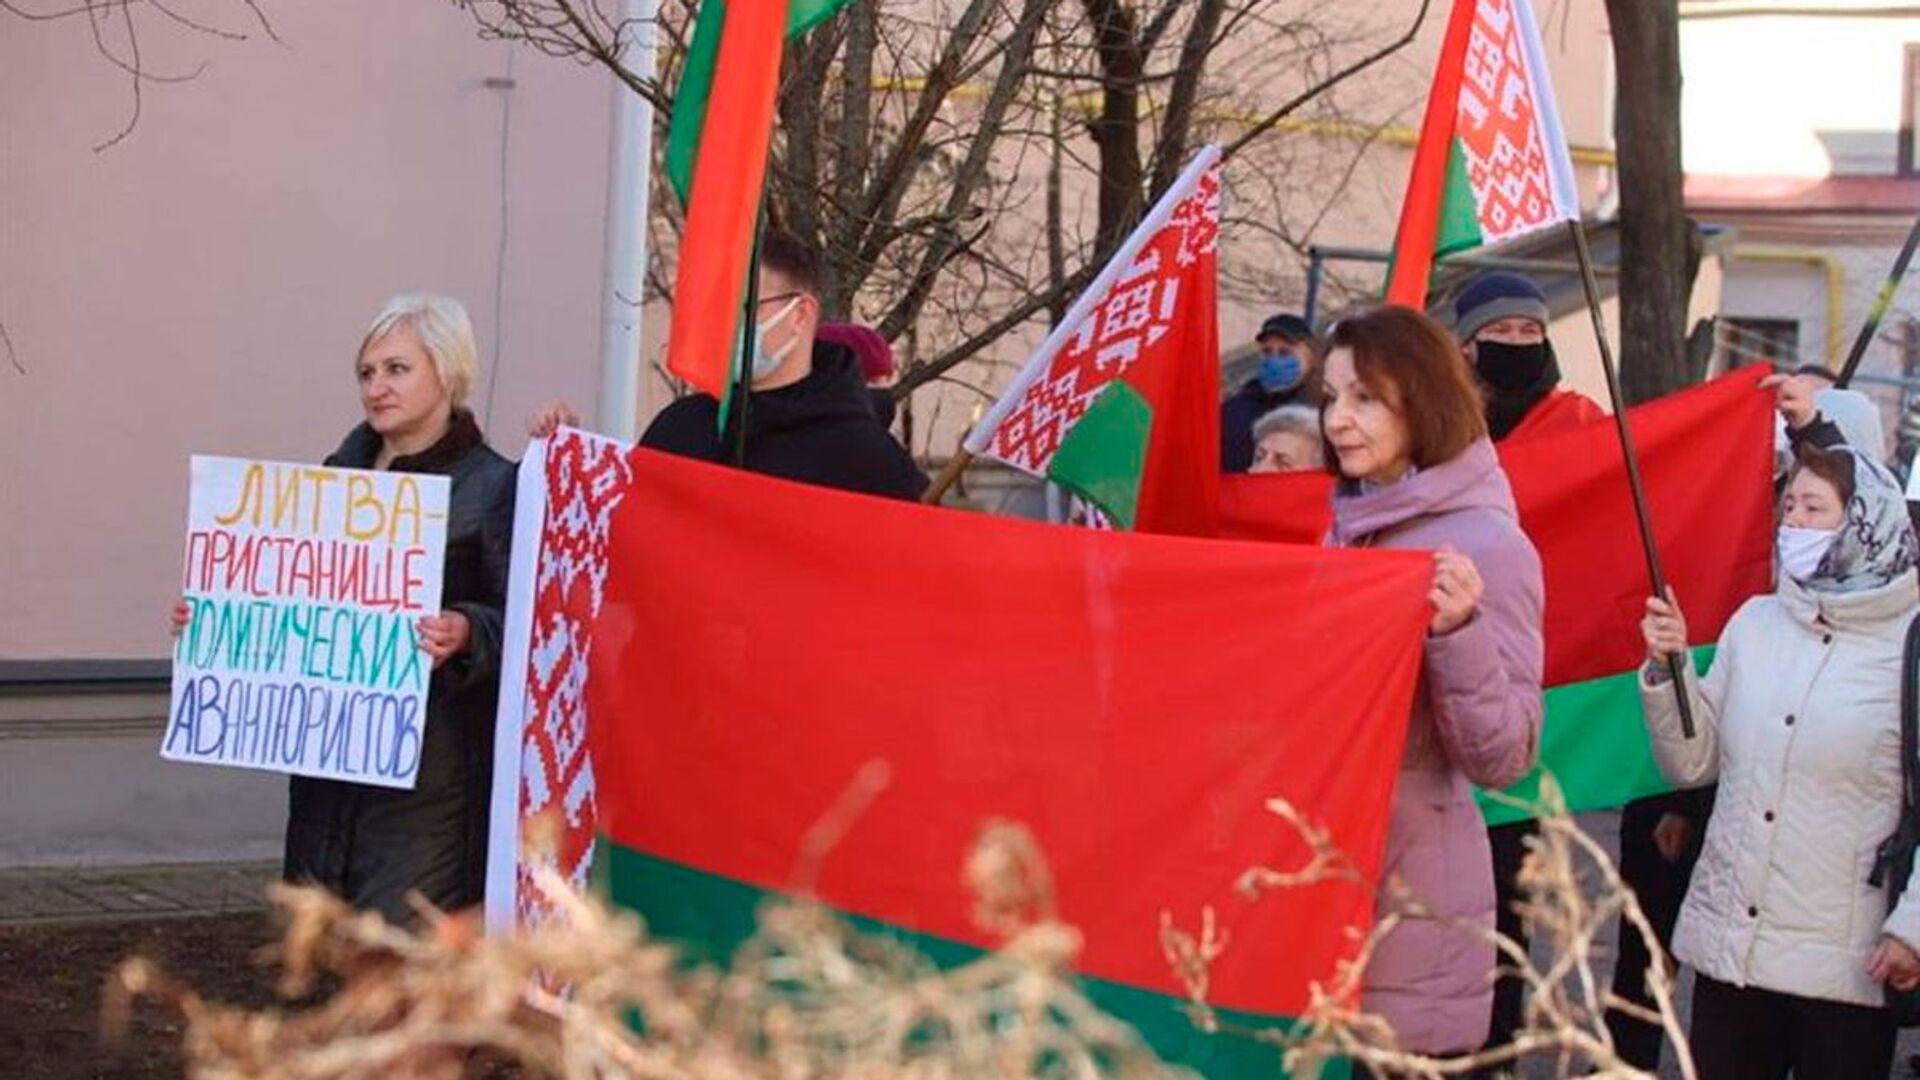 Protesty pod polskimi konsulatami na Białorusi - Sputnik Polska, 1920, 24.03.2021